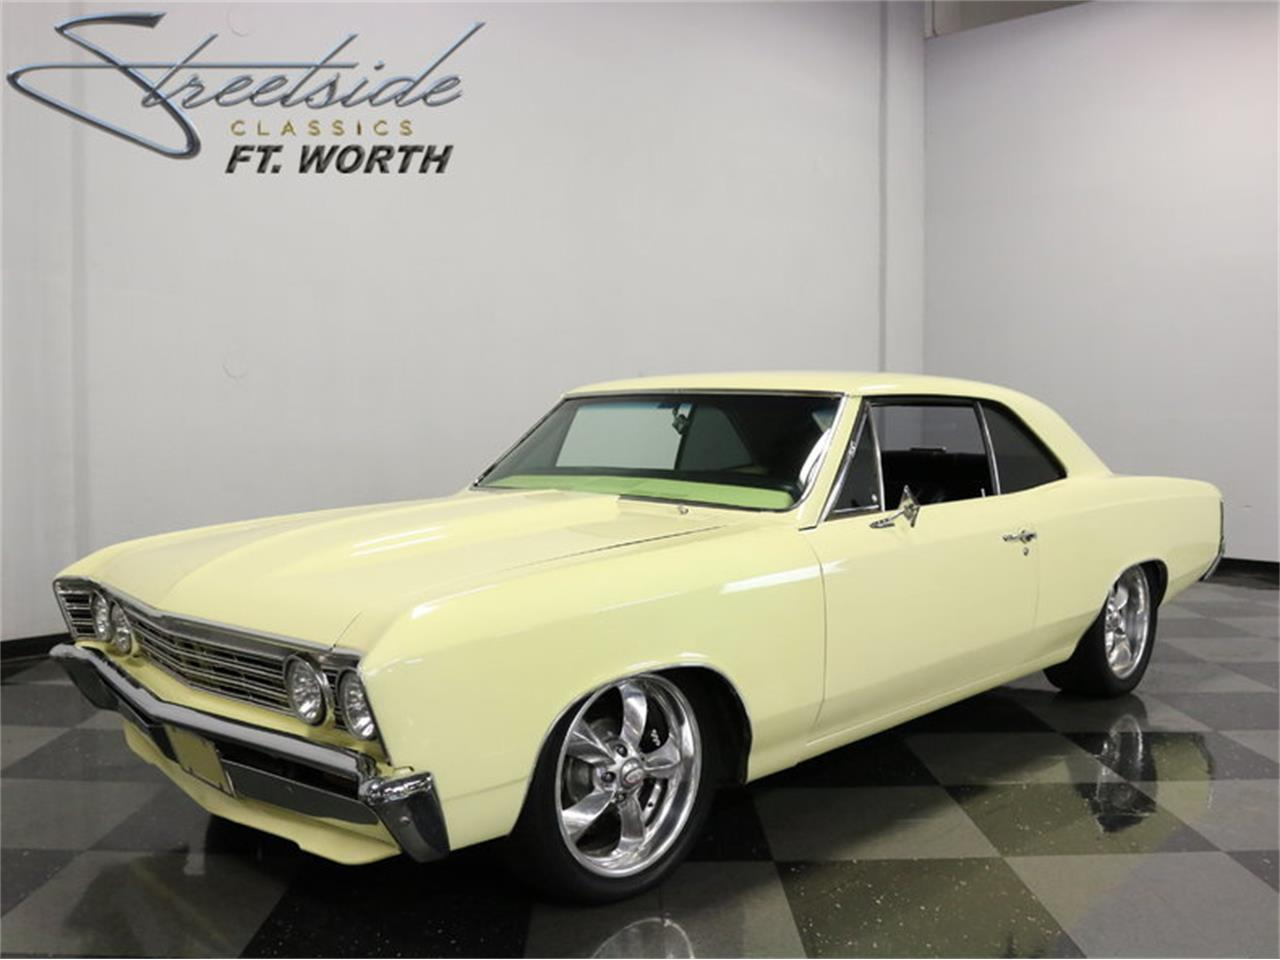 For Sale: 1967 Chevrolet Chevelle Malibu Restomod in Ft Worth, Texas